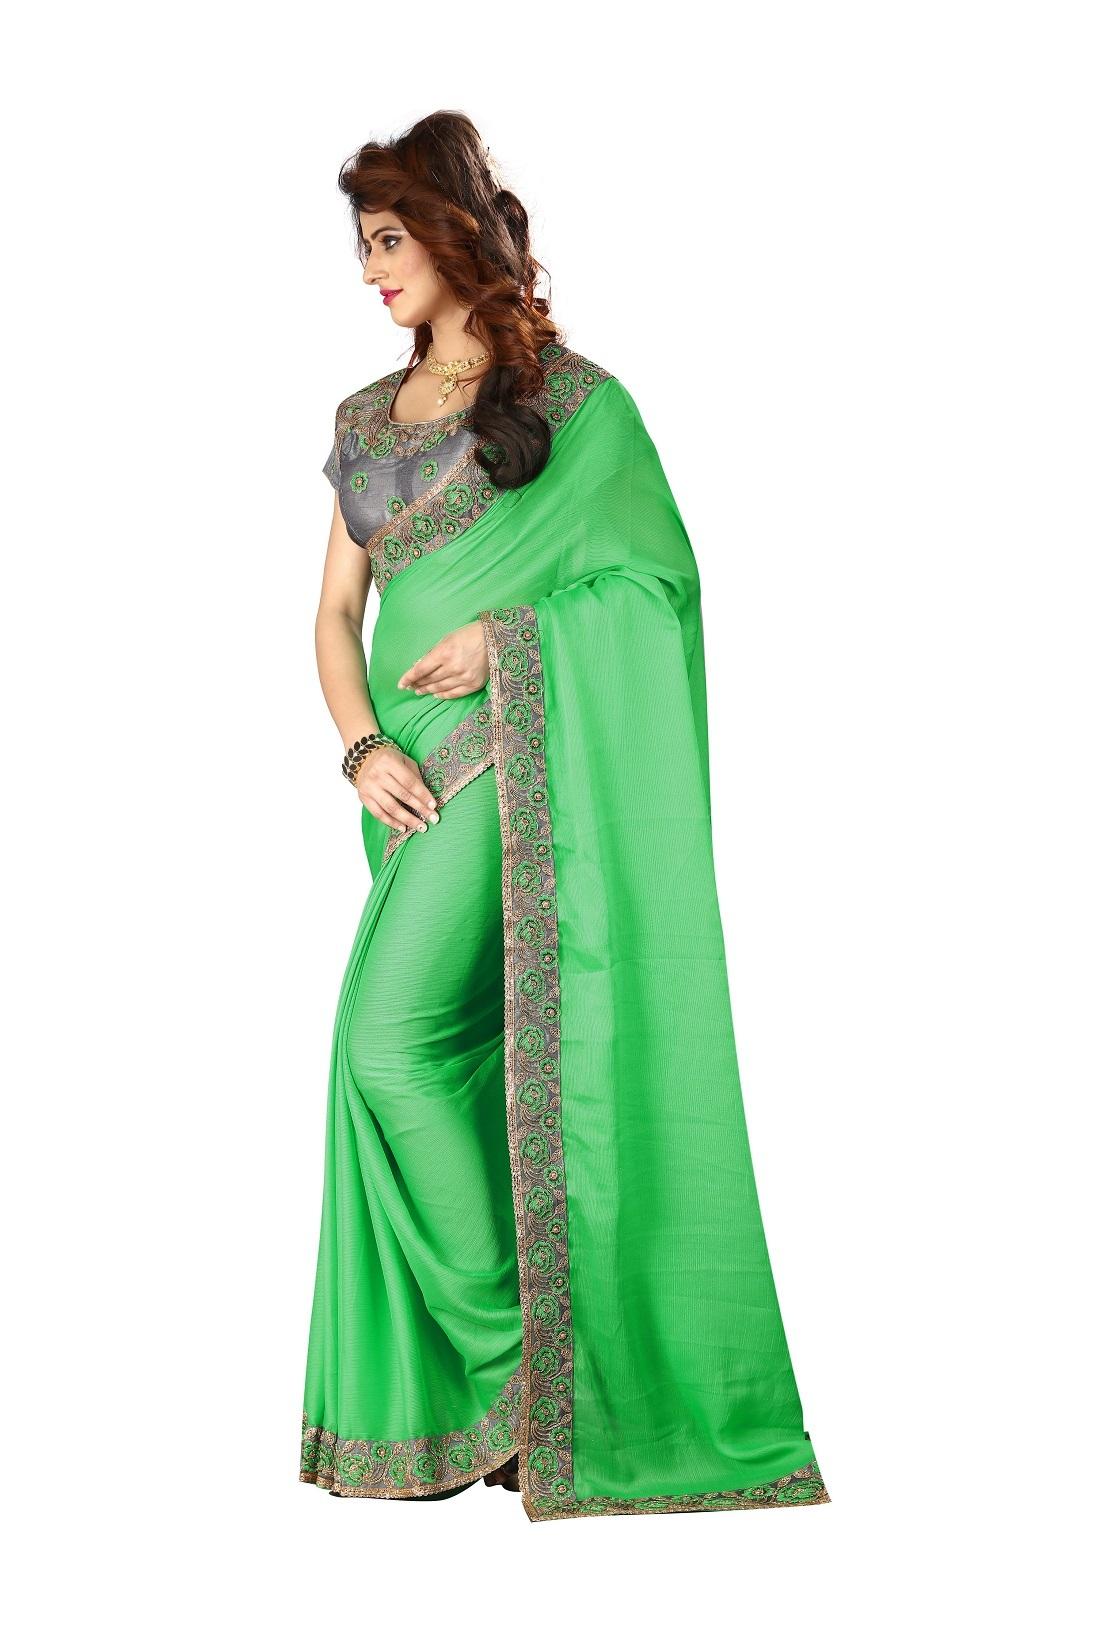 Designer Chiffon Saree with Golden lace